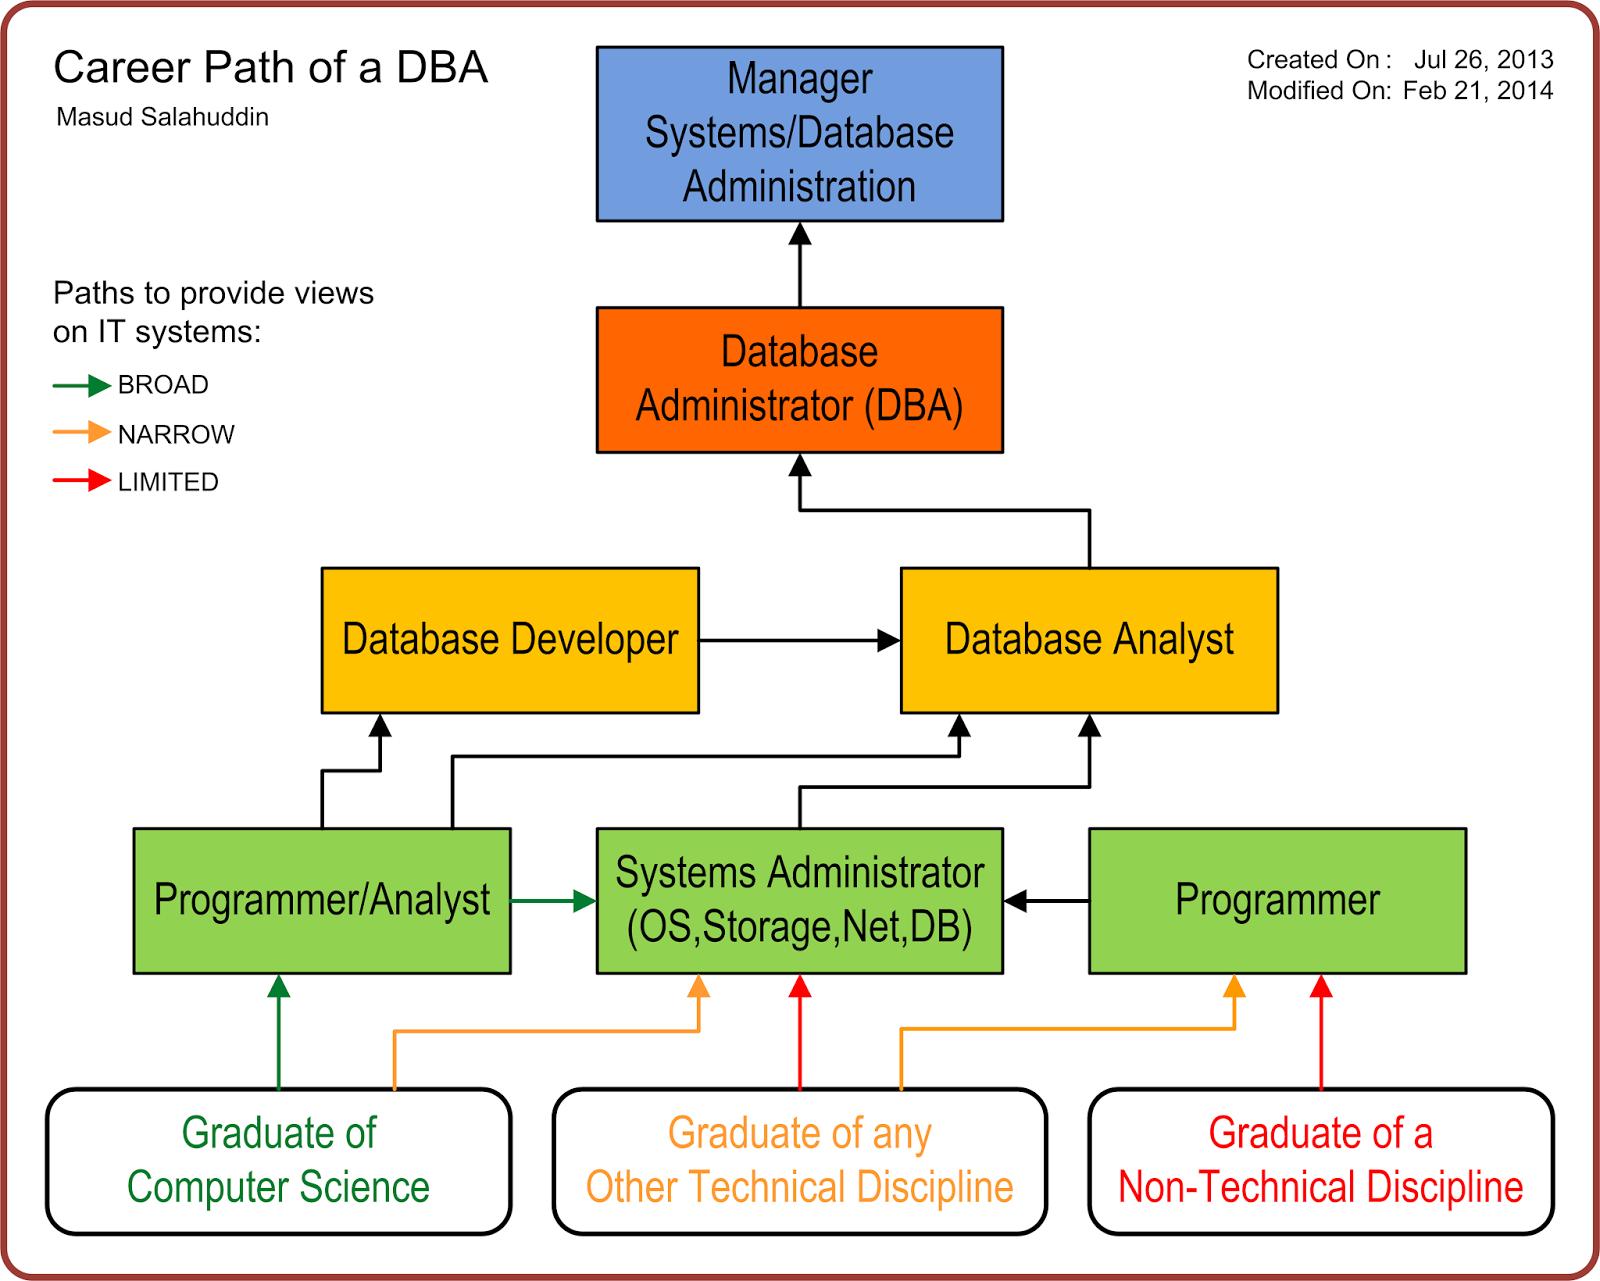 career path for accountants